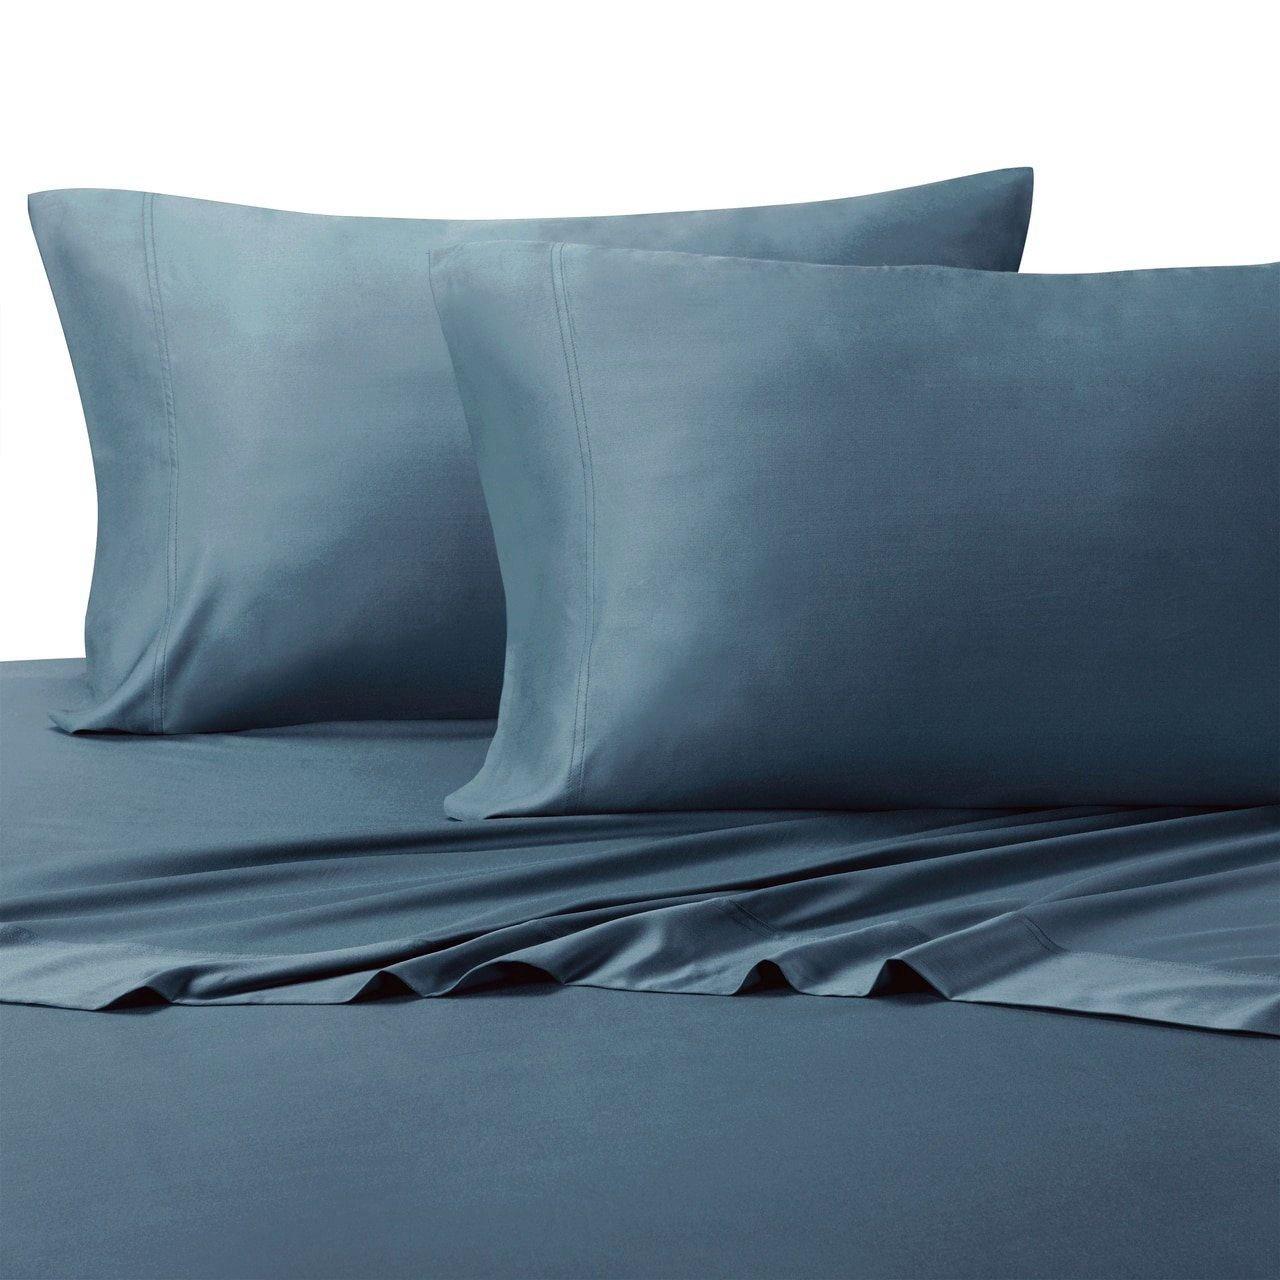 Linenwalas Bamboo Sheets Queen - Softest And Thermal Regulating Sheets - Anti Bacterial Bed Sheet Set - 100 % Natural Bamboo (Queen, Bahamas Blue)